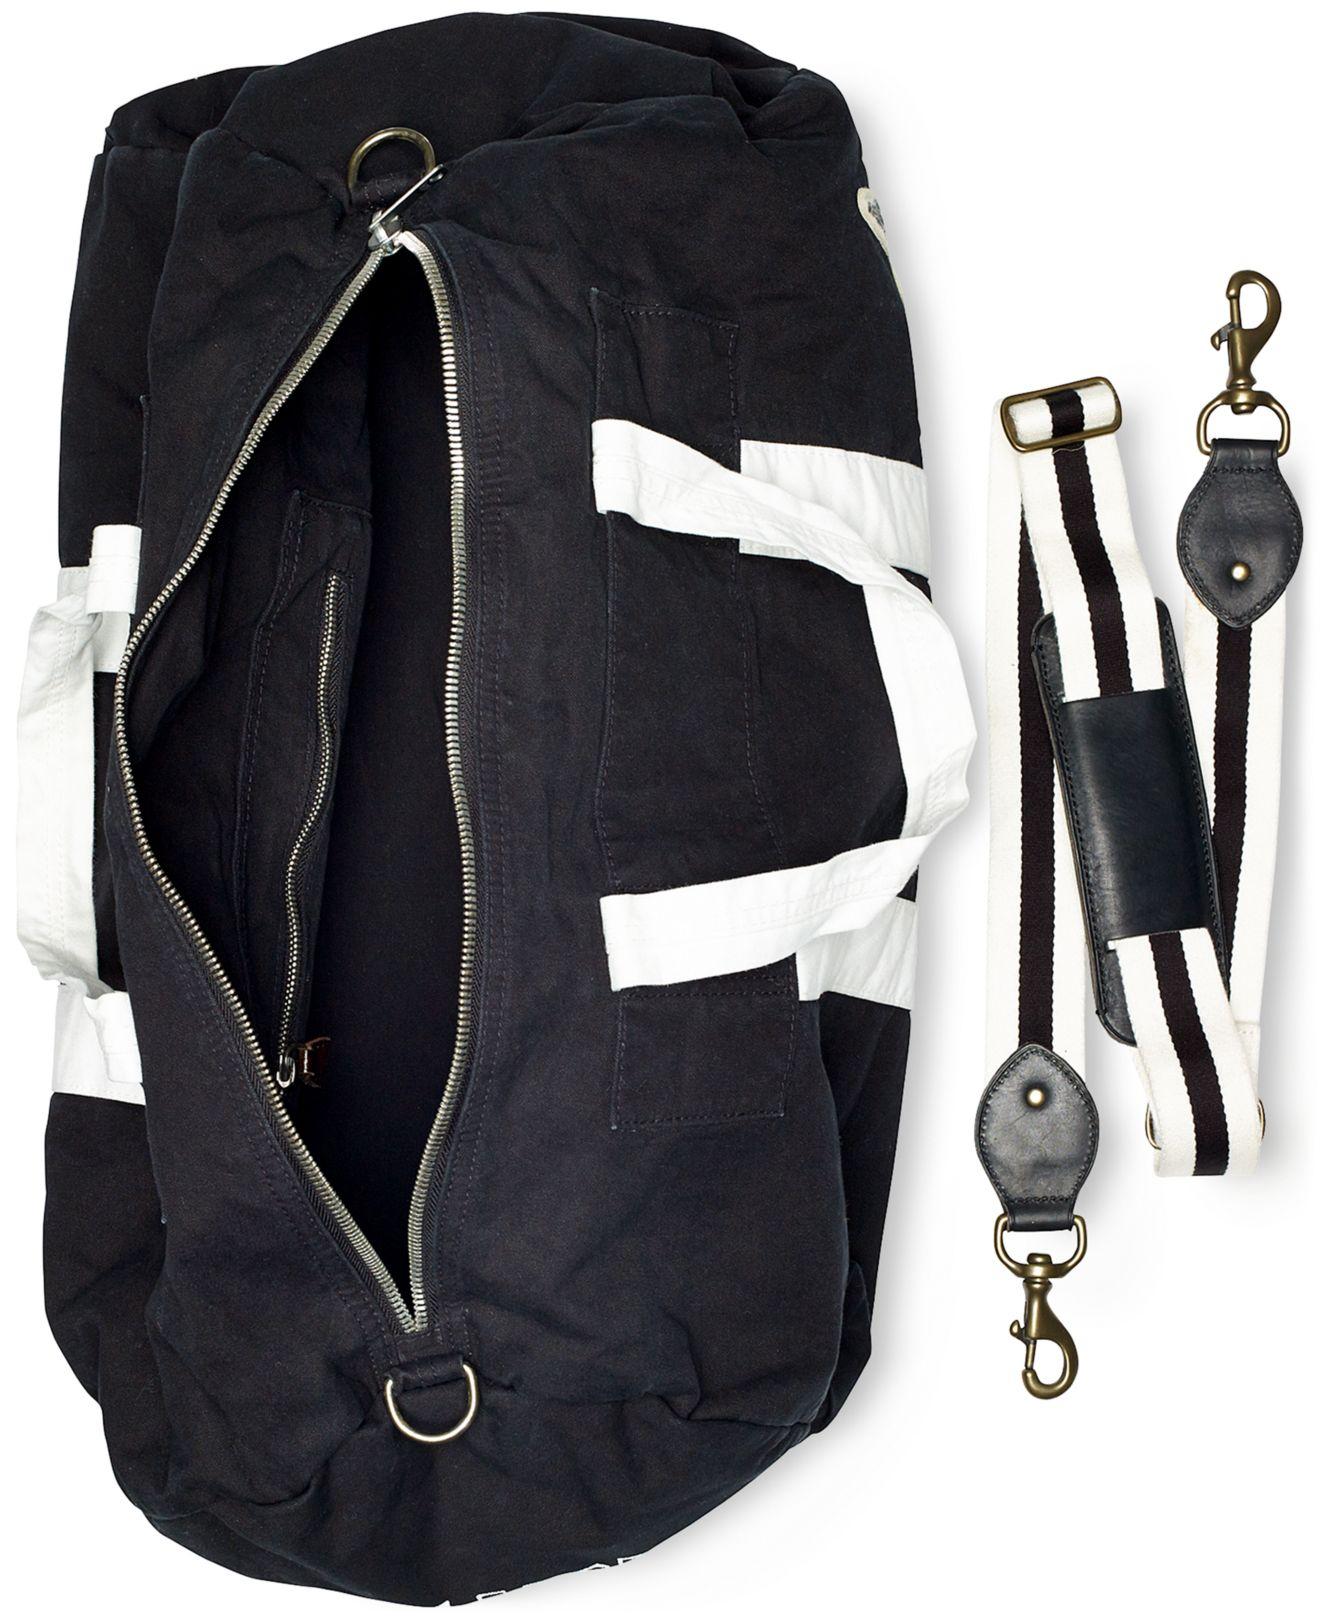 Lyst - Polo Ralph Lauren Canvas Boxing Duffel Bag in Black for Men d1223c266e90a